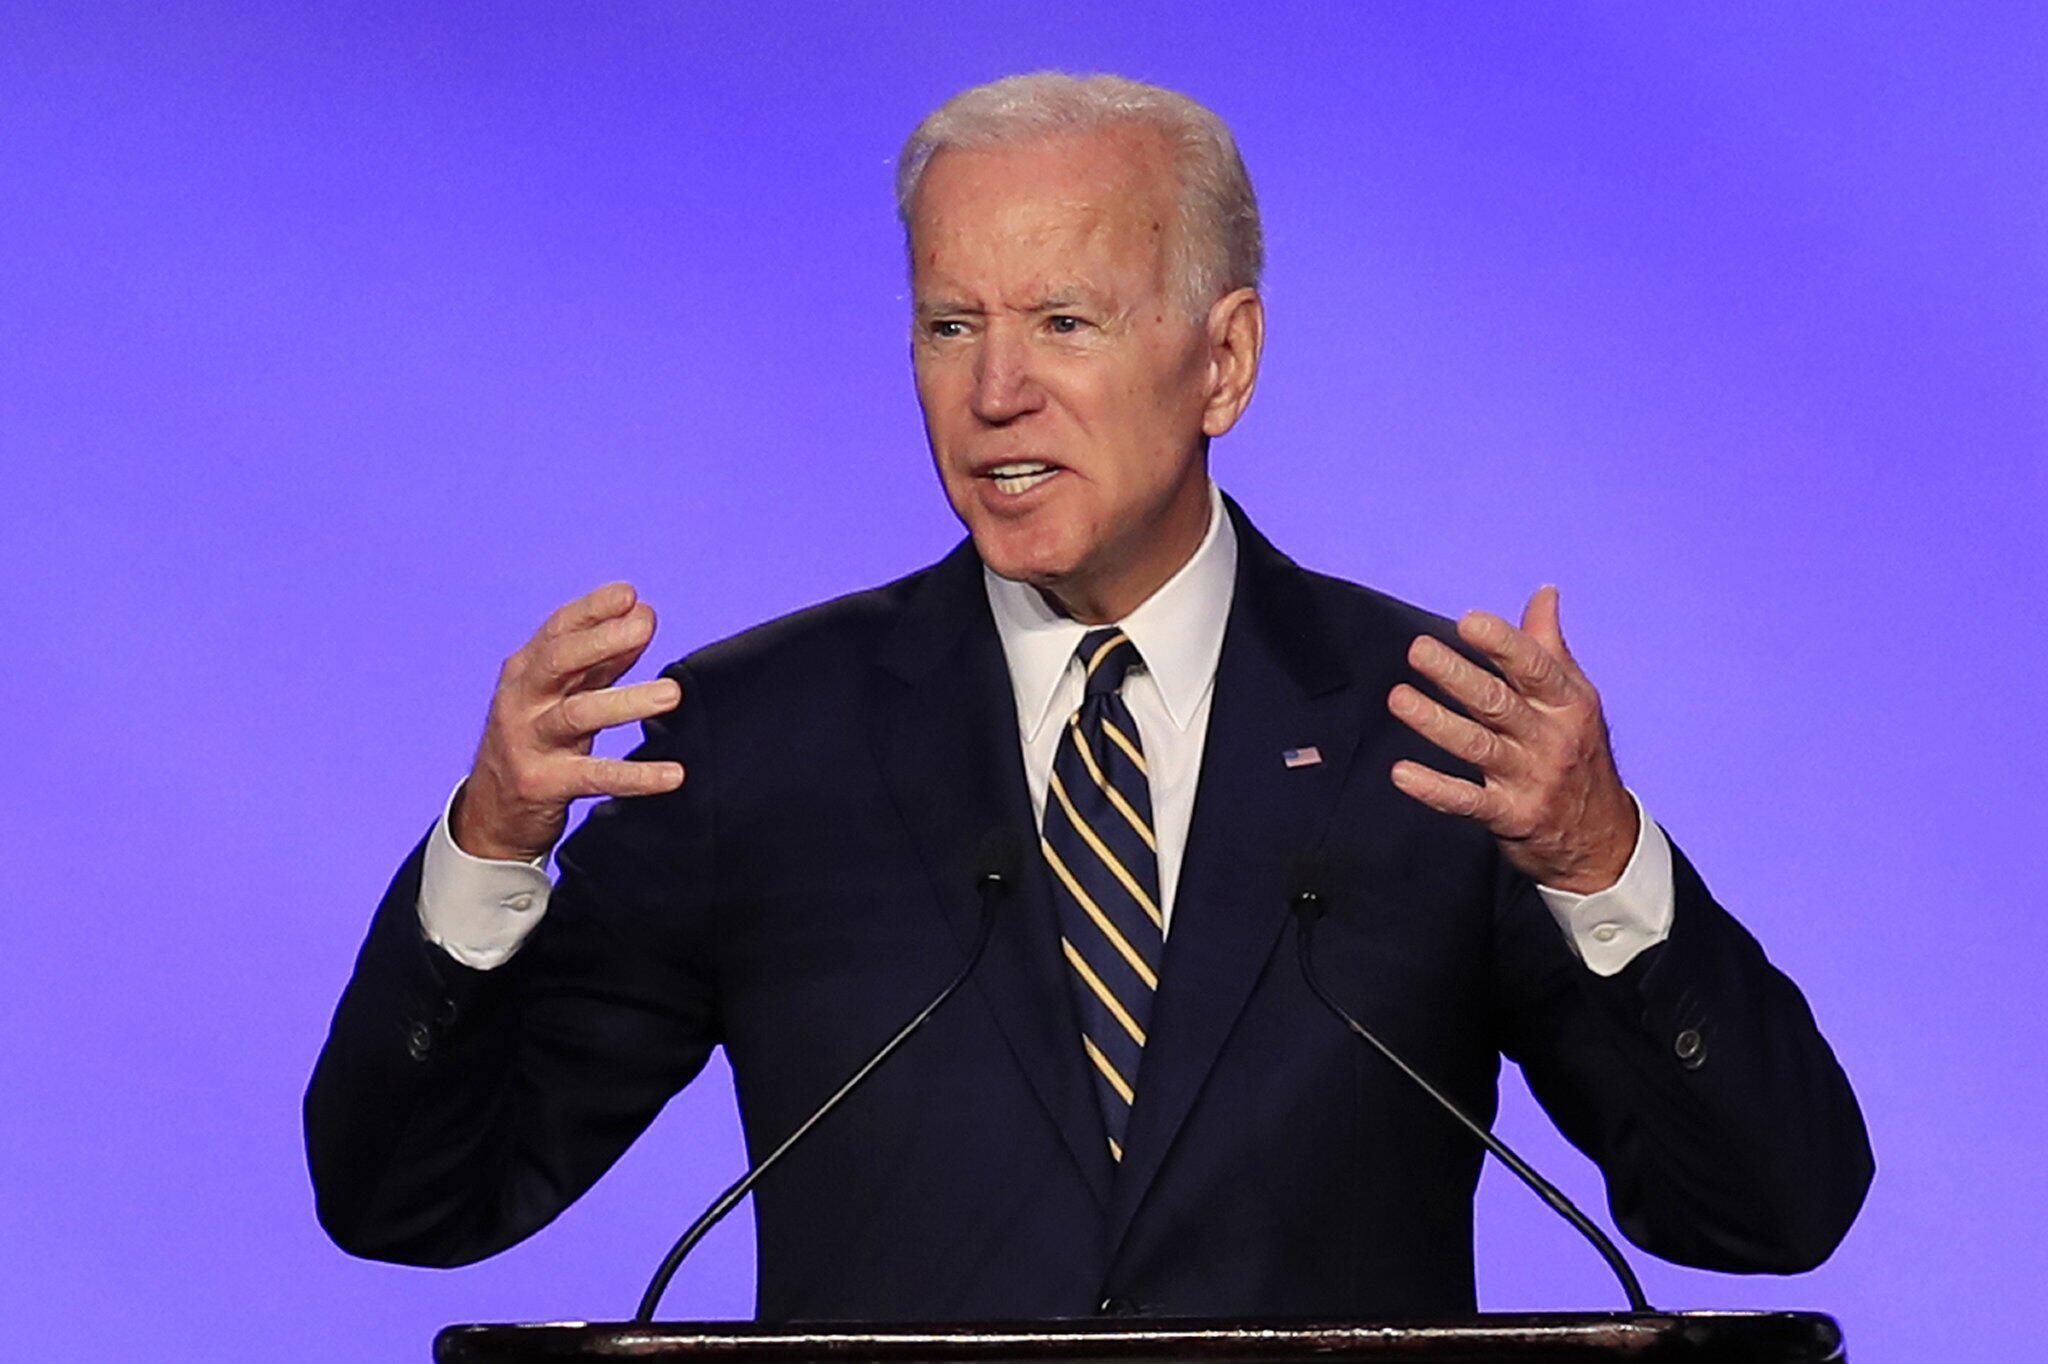 Joe Biden kandidiert 2020: Donald Trump warnt vor schmutzigem Wahlkampf